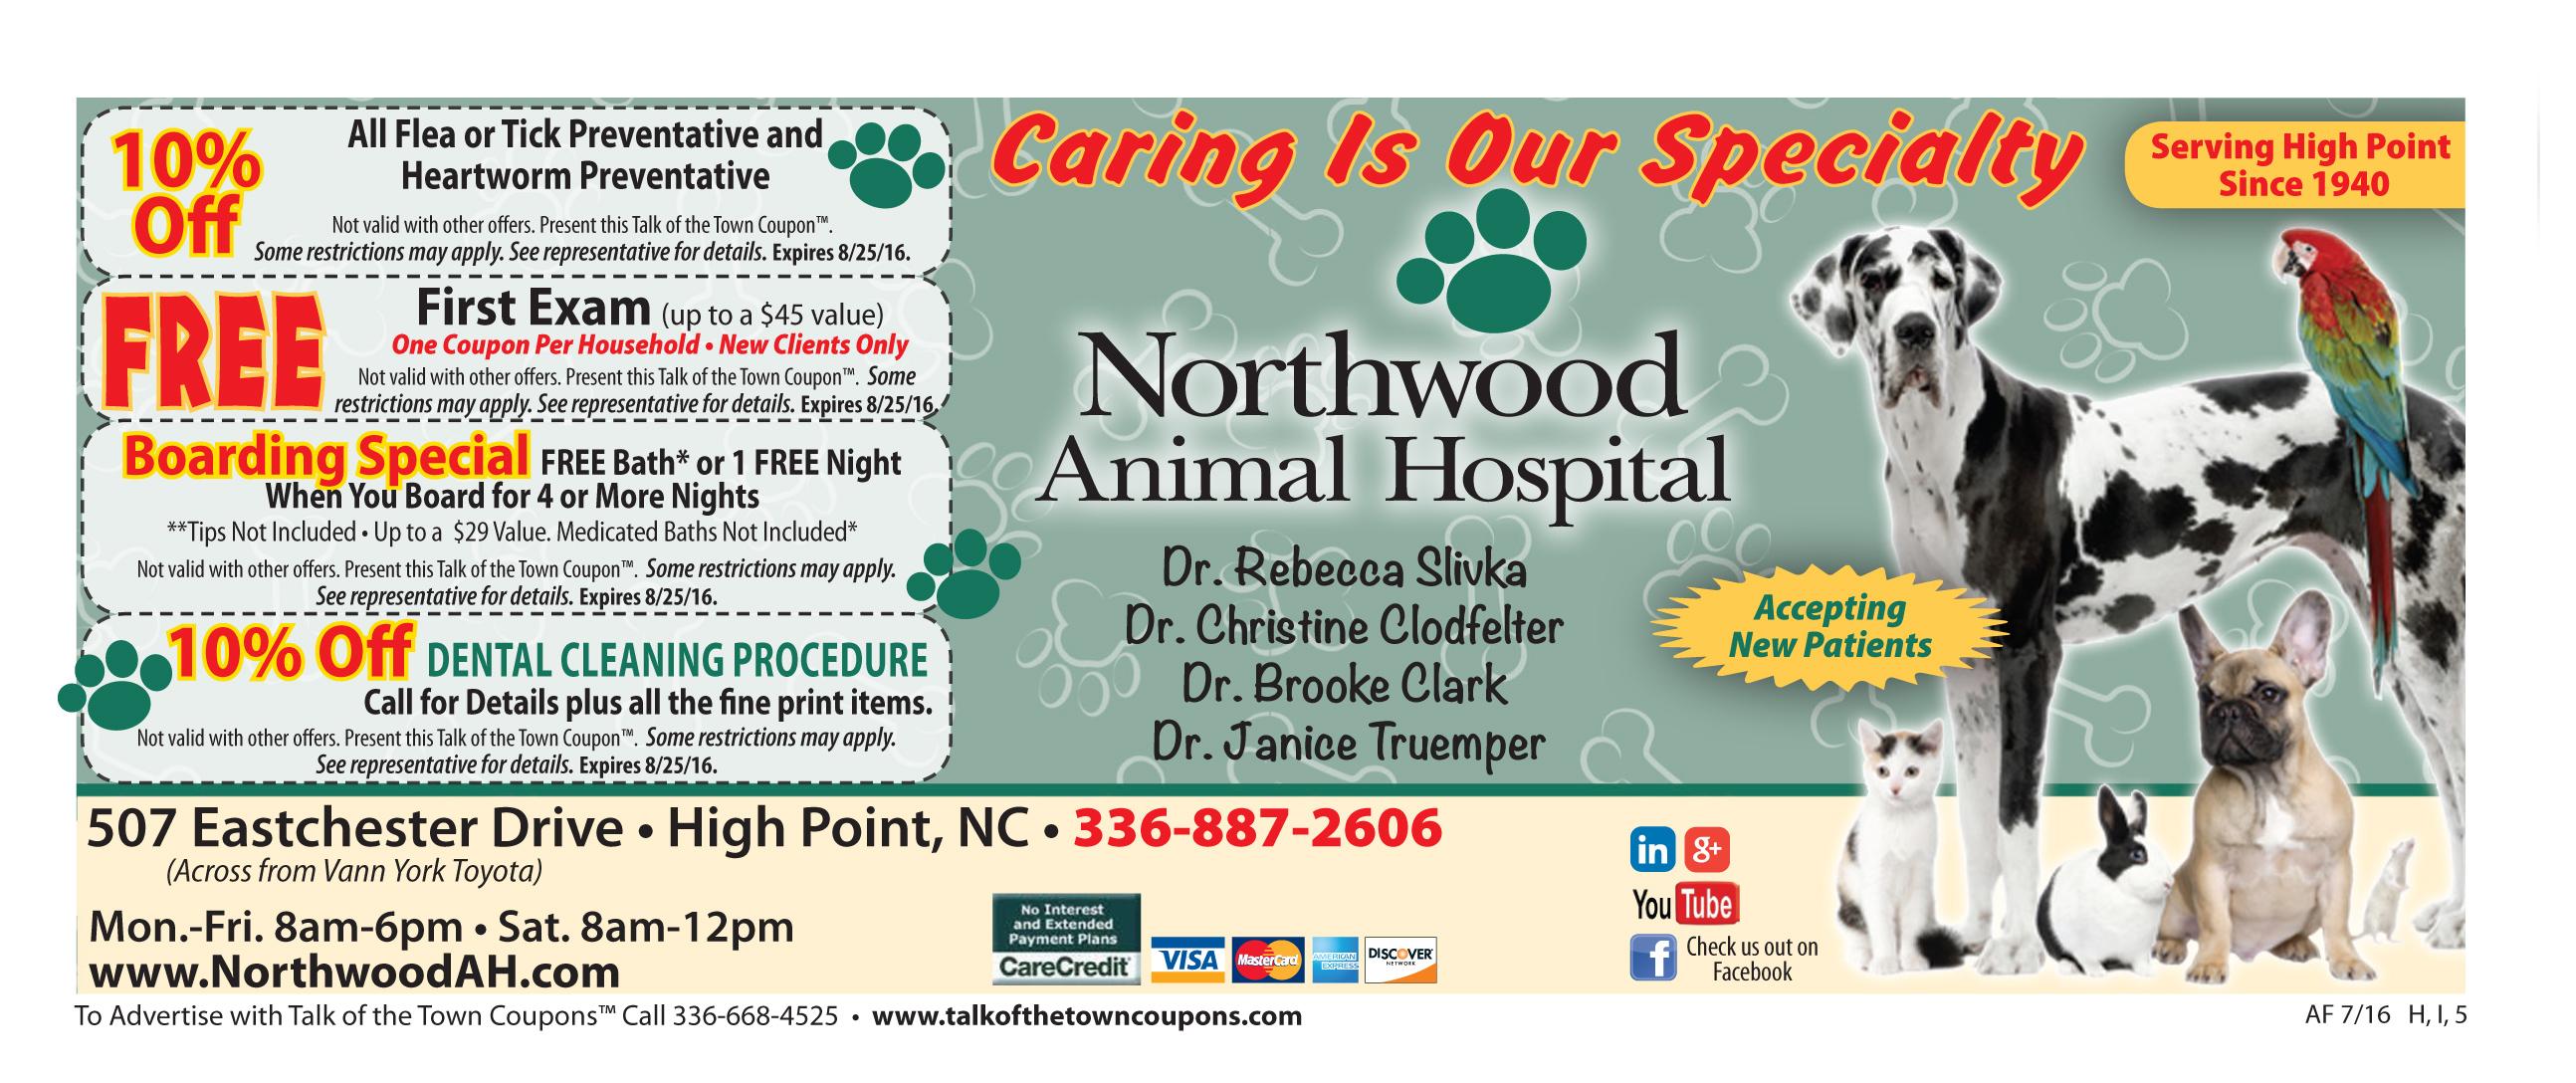 Northwood Animal Hospital Offer